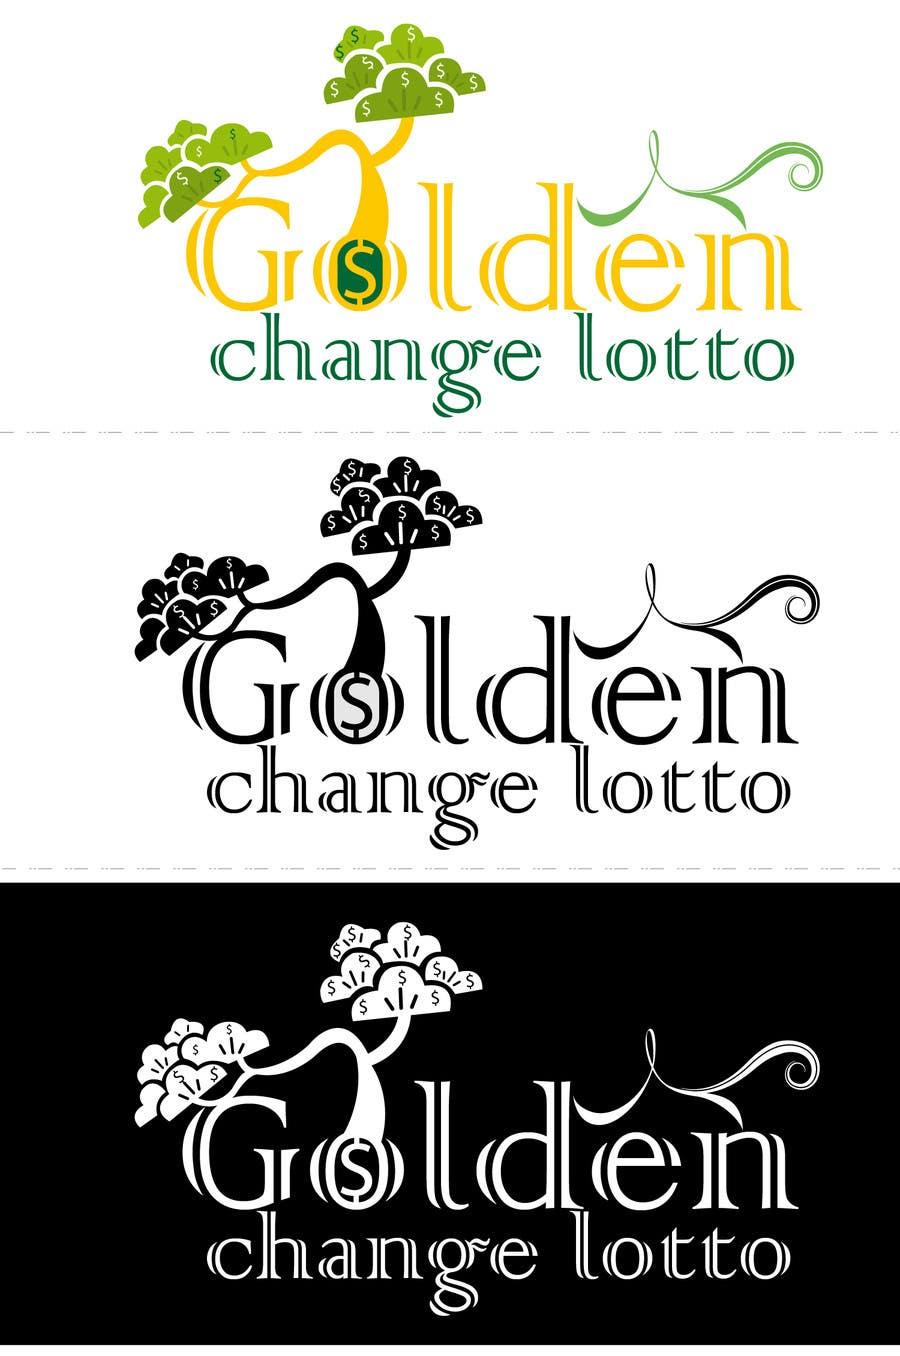 Bài tham dự cuộc thi #                                        35                                      cho                                         Design a Logo for A website and Print Material